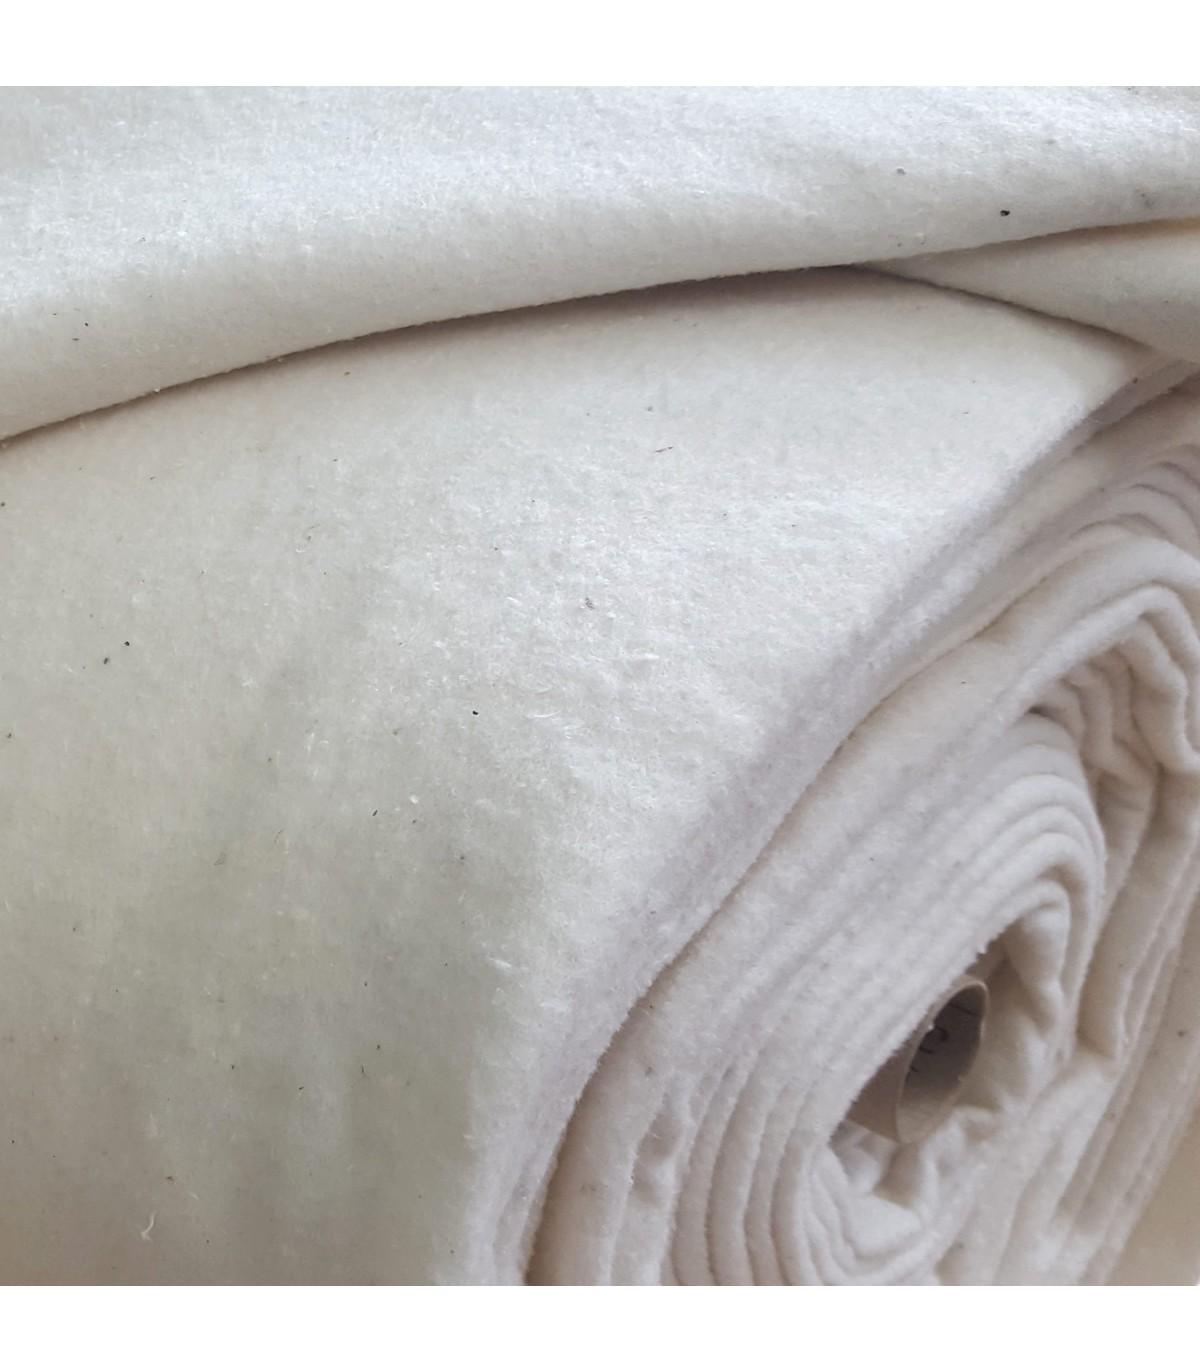 guata napa de algodón para acolchar